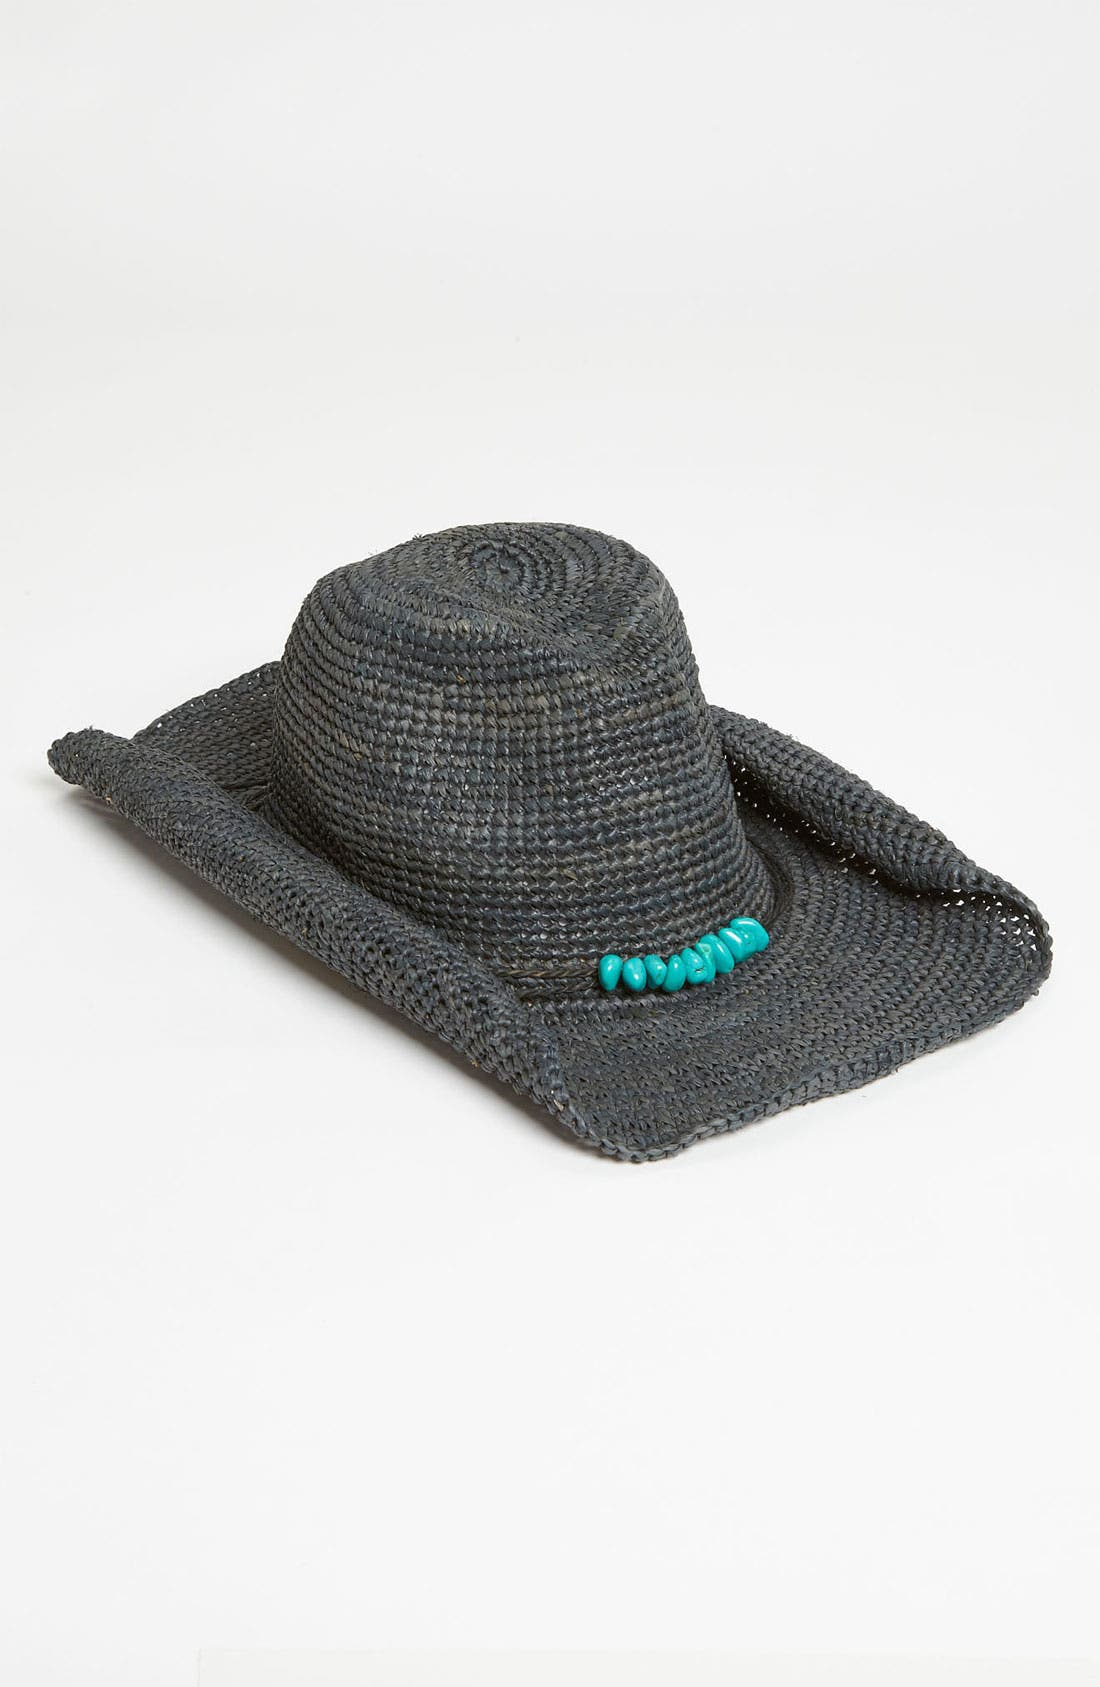 Alternate Image 1 Selected - Flora Bella Raffia Cowboy Hat